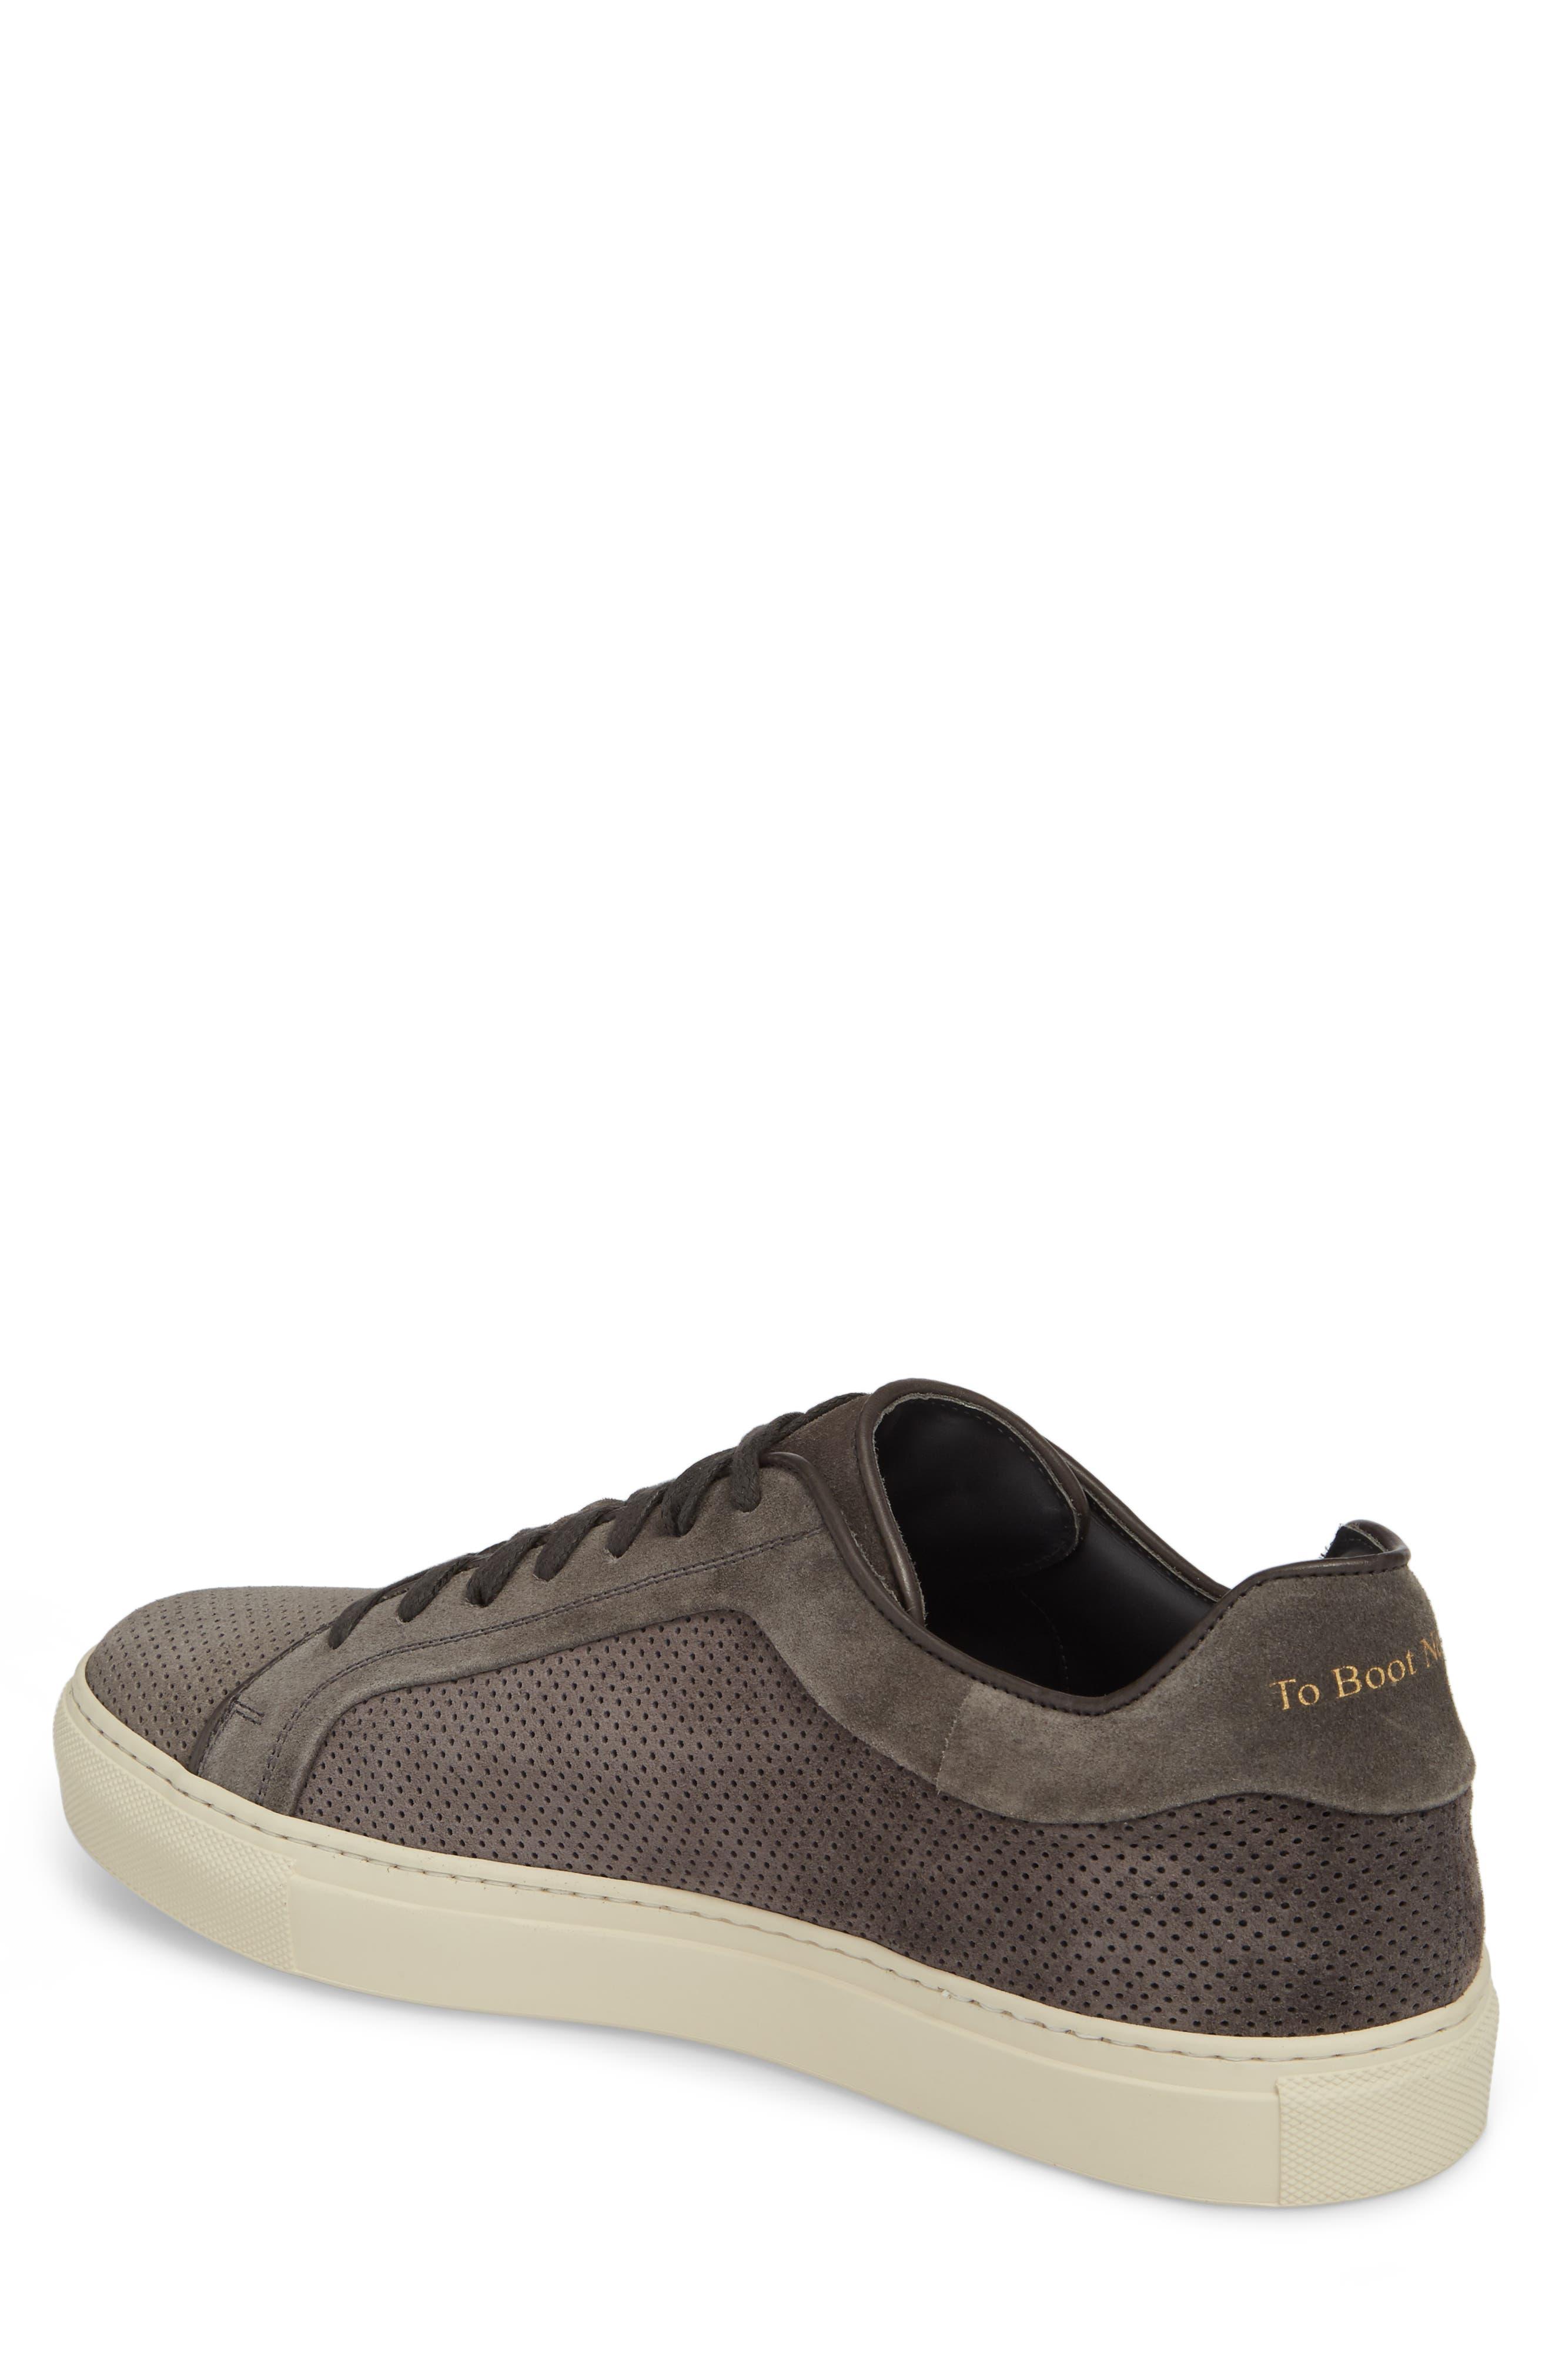 Hendrick Perforated Sneaker,                             Alternate thumbnail 2, color,